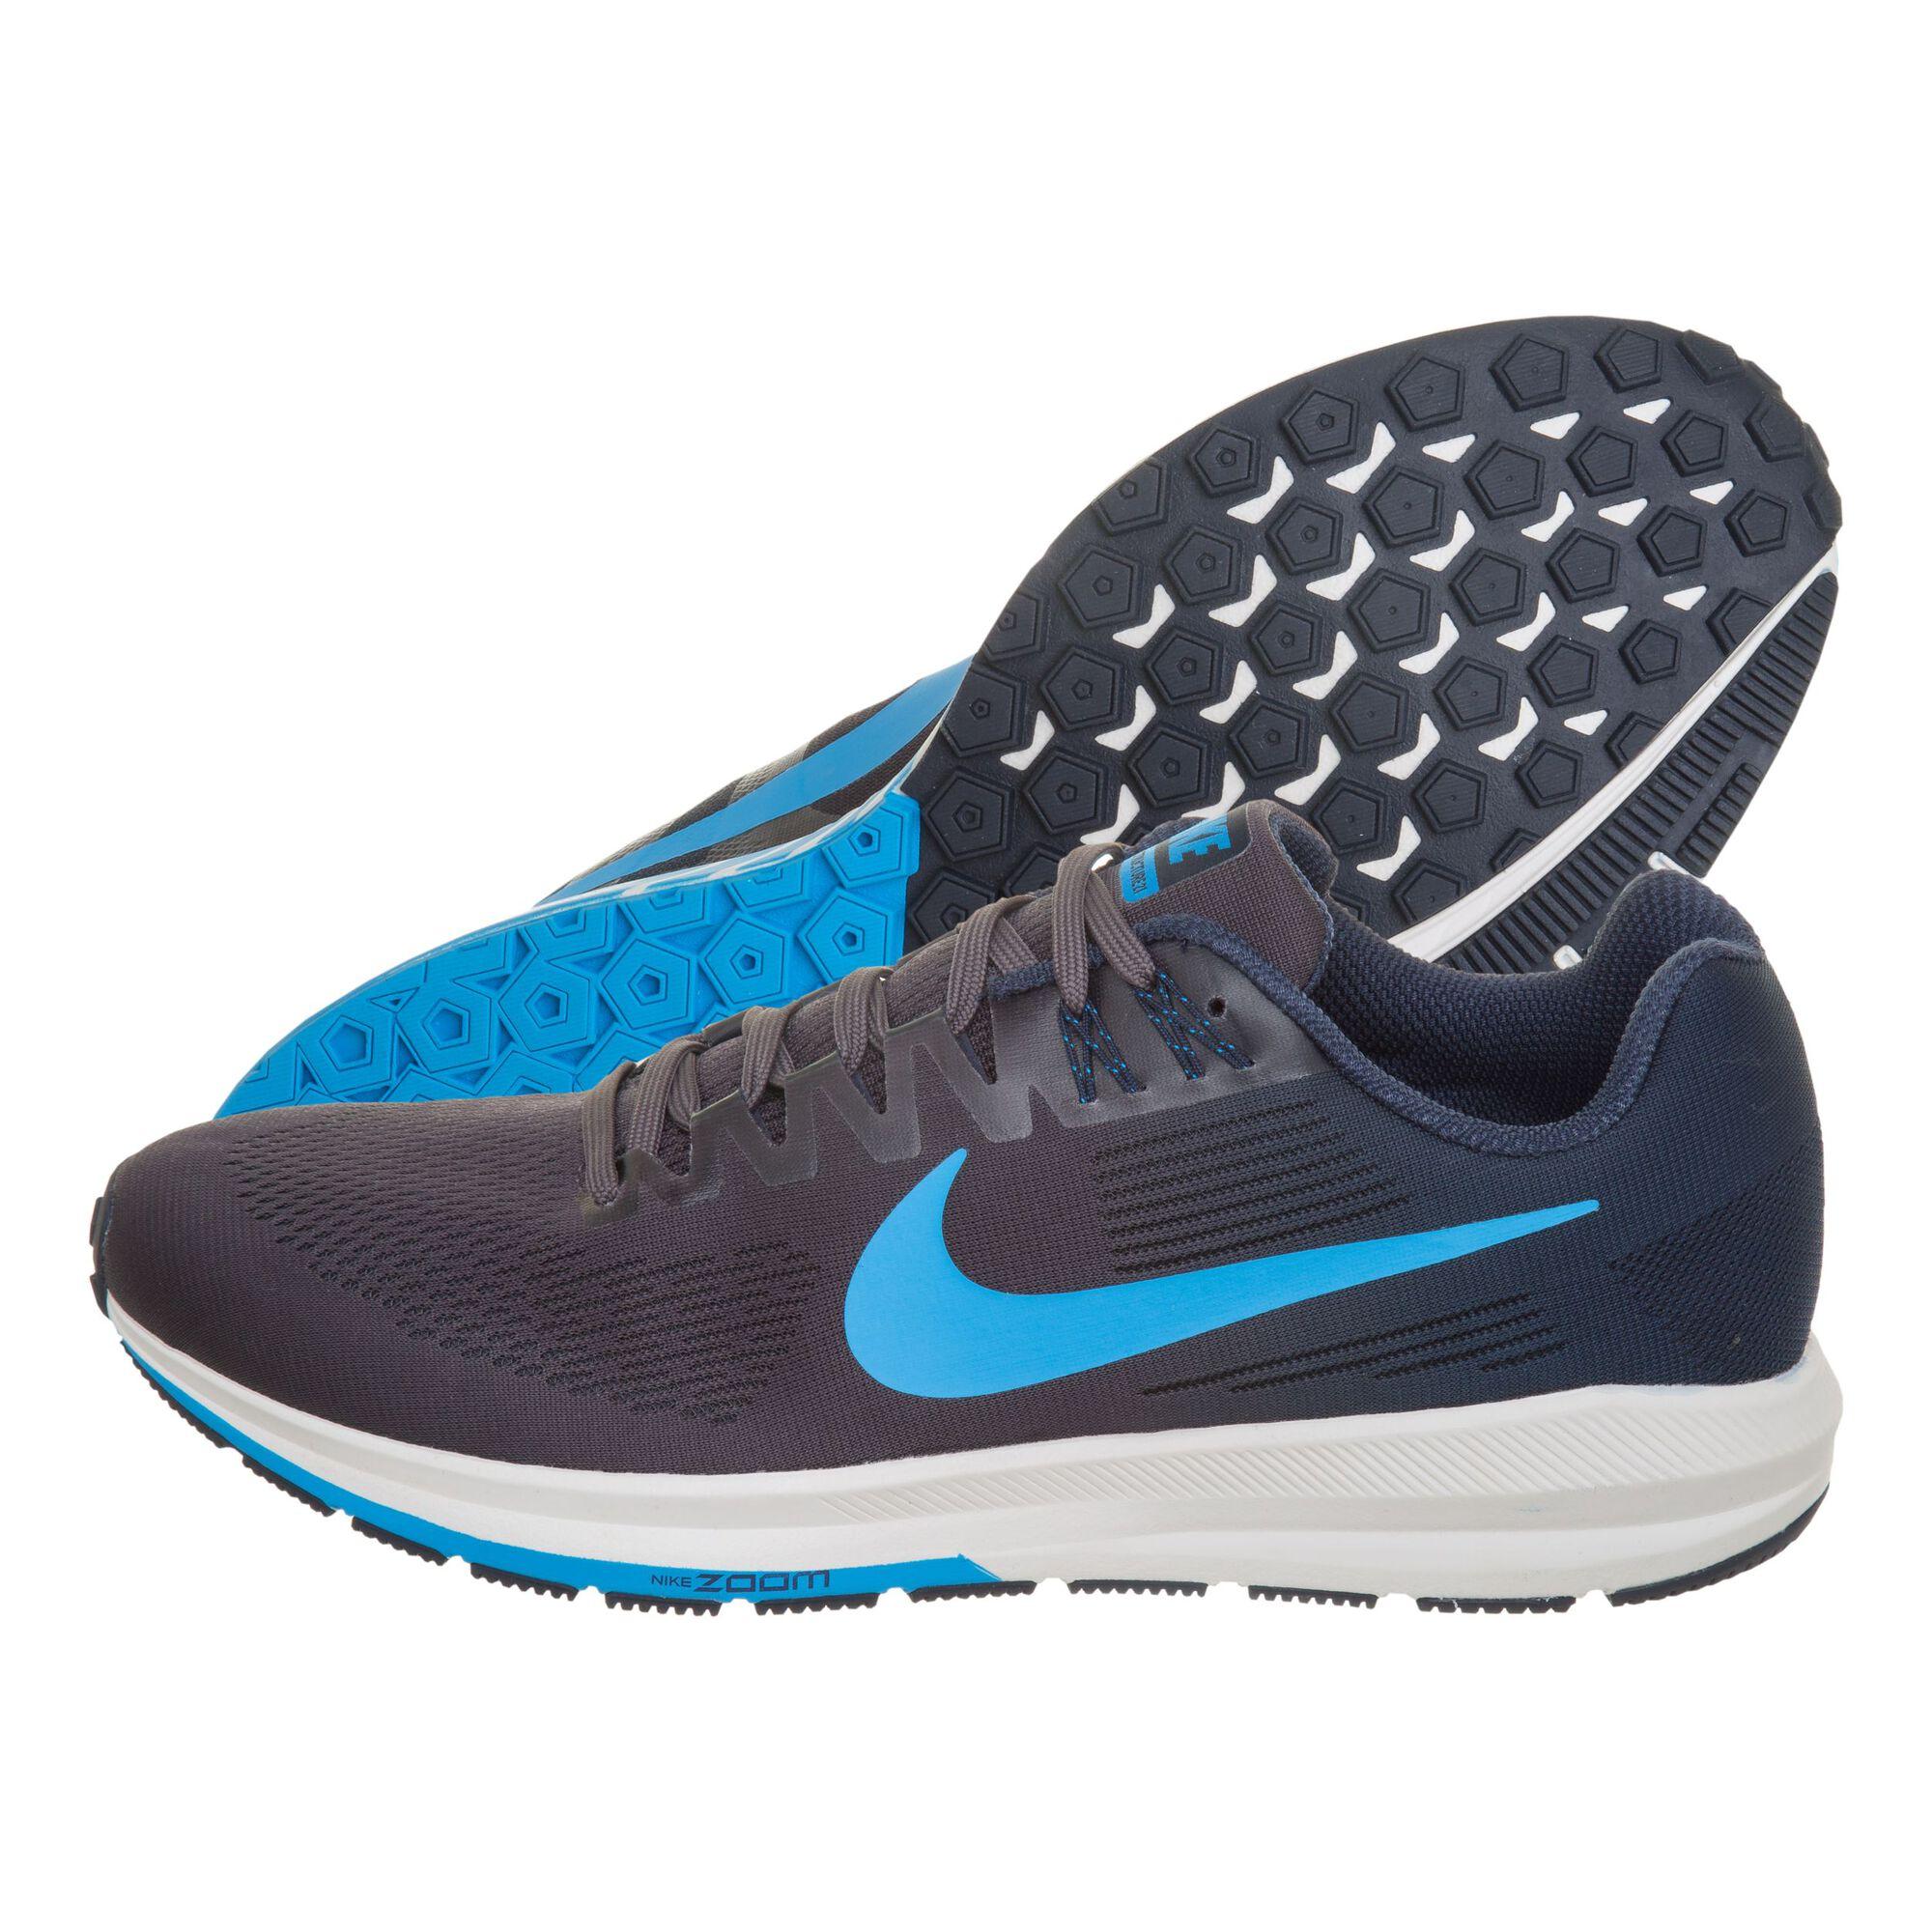 7fa19c7b7eb6d buy Nike Air Zoom Structure 21 Stability Running Shoe Men - Dark ...